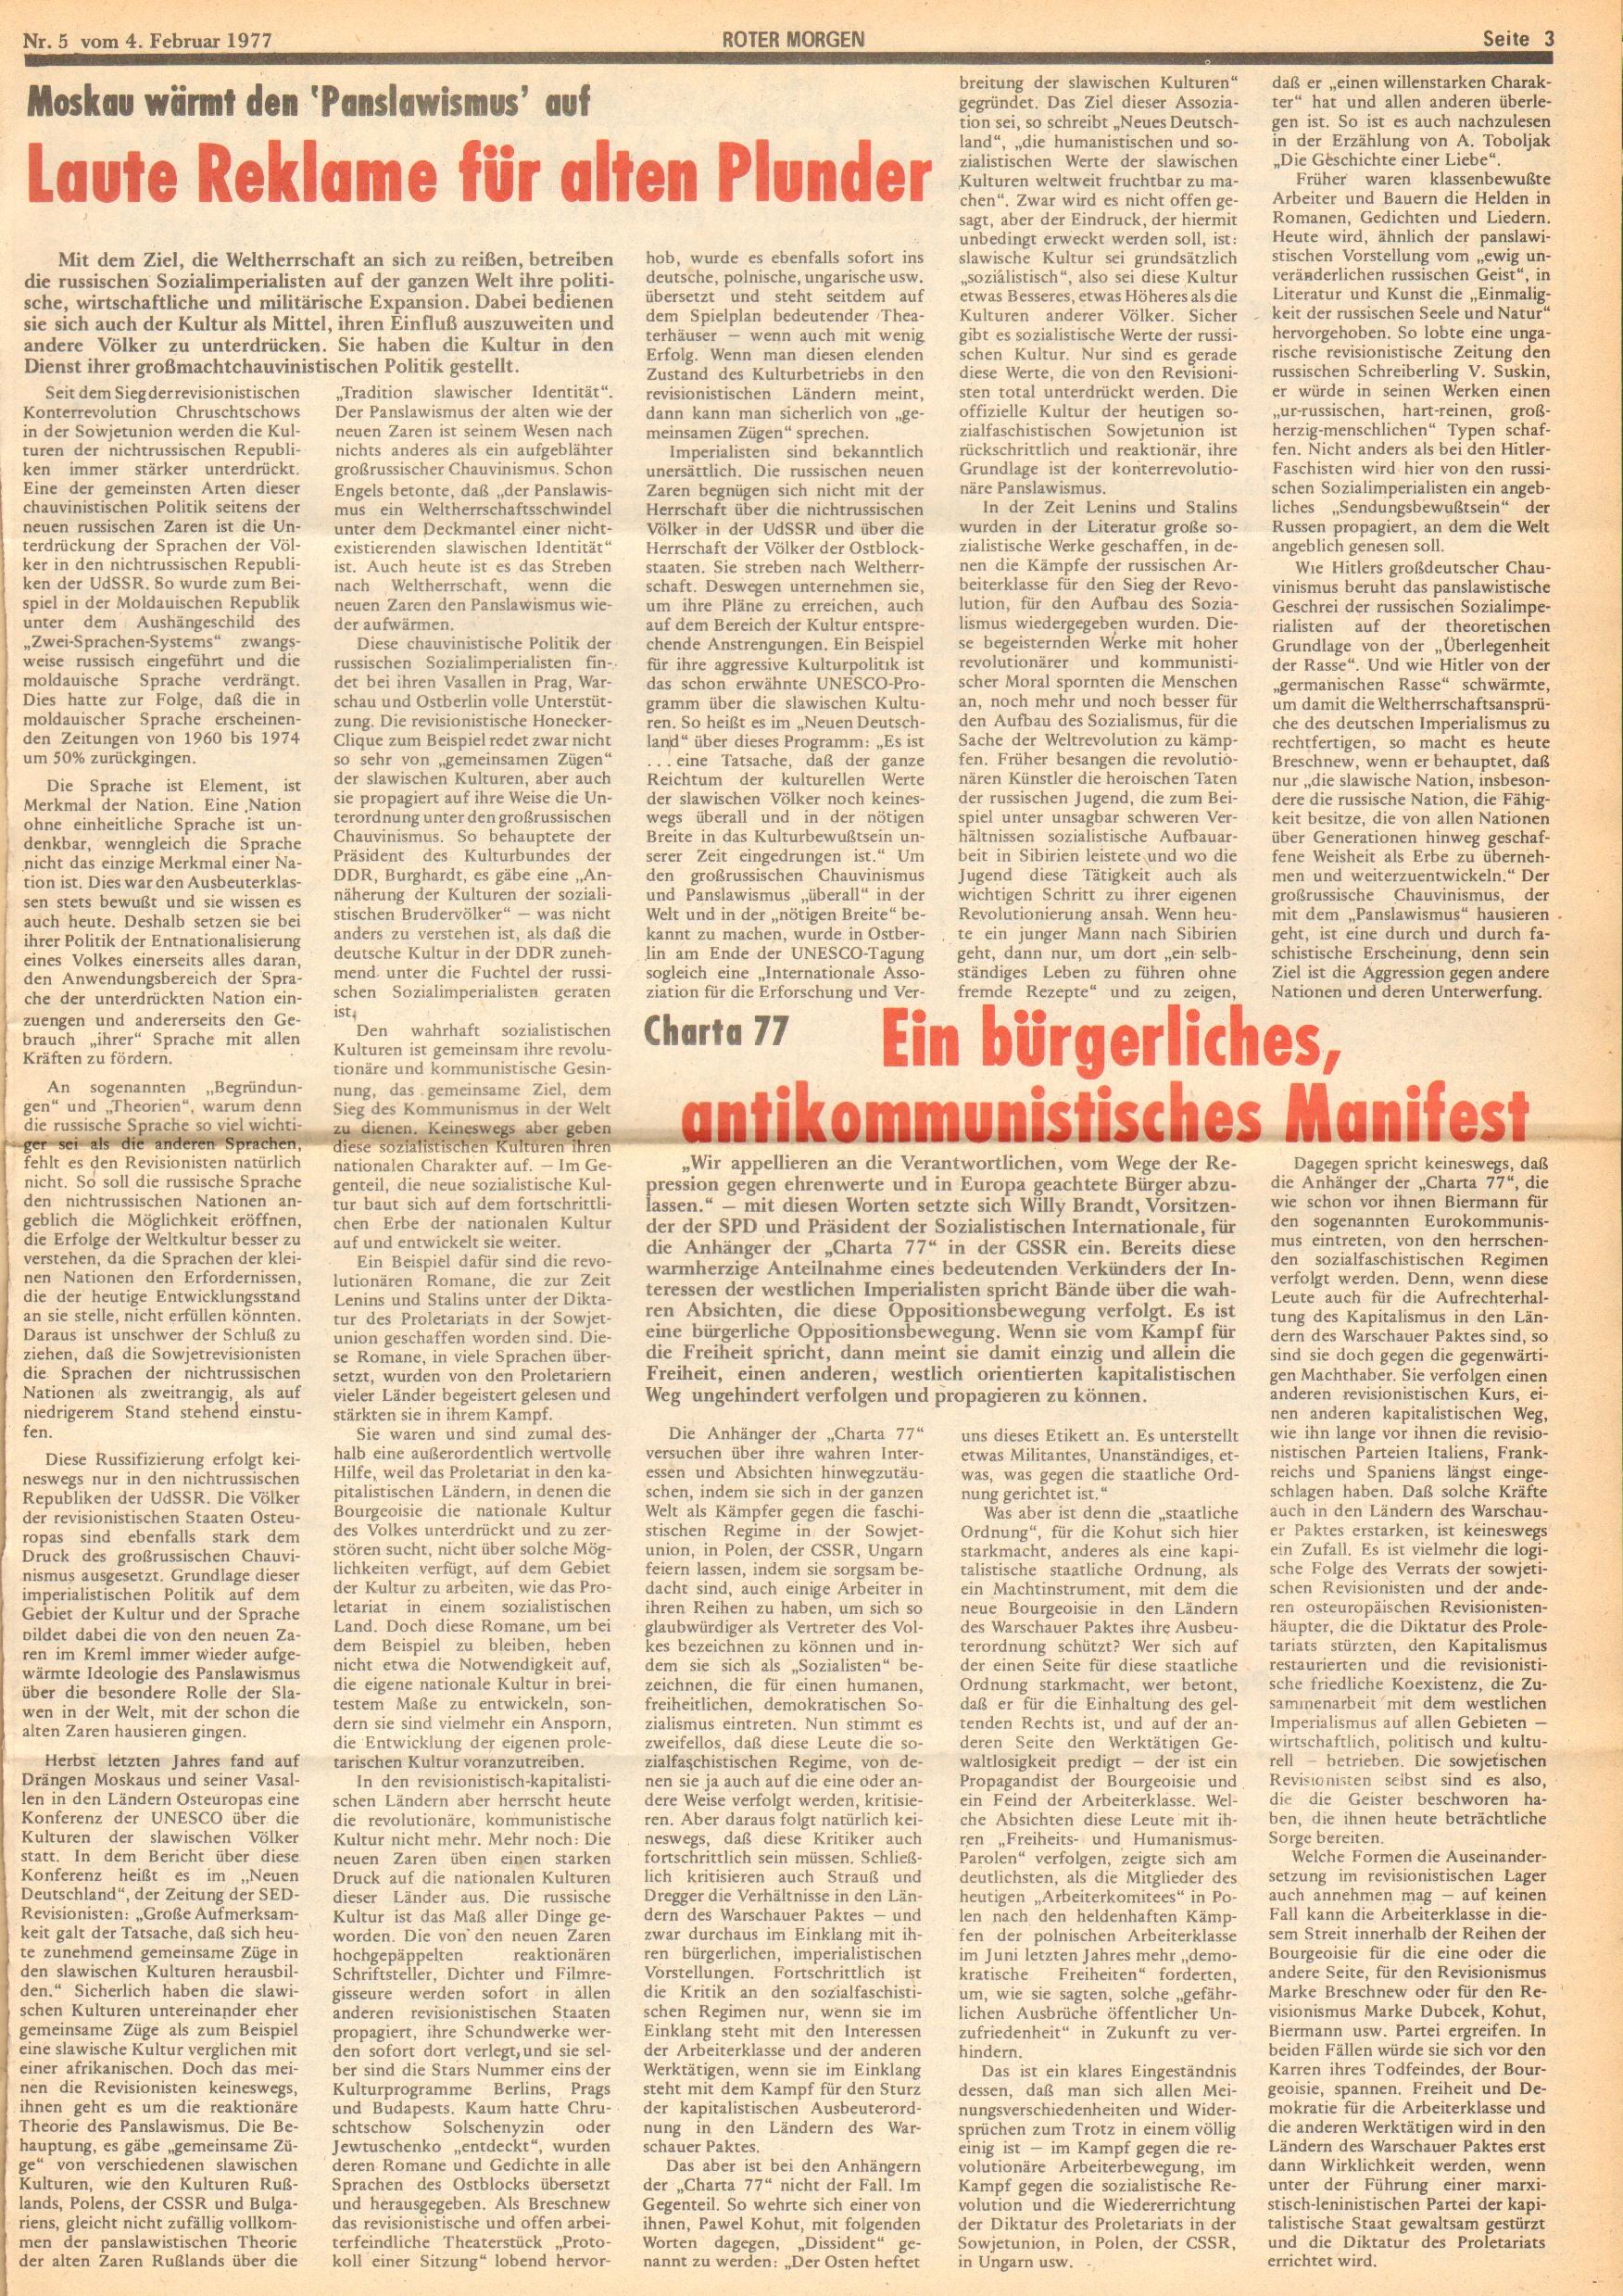 Roter Morgen, 11. Jg., 4. Februar 1977, Nr. 5, Seite 3